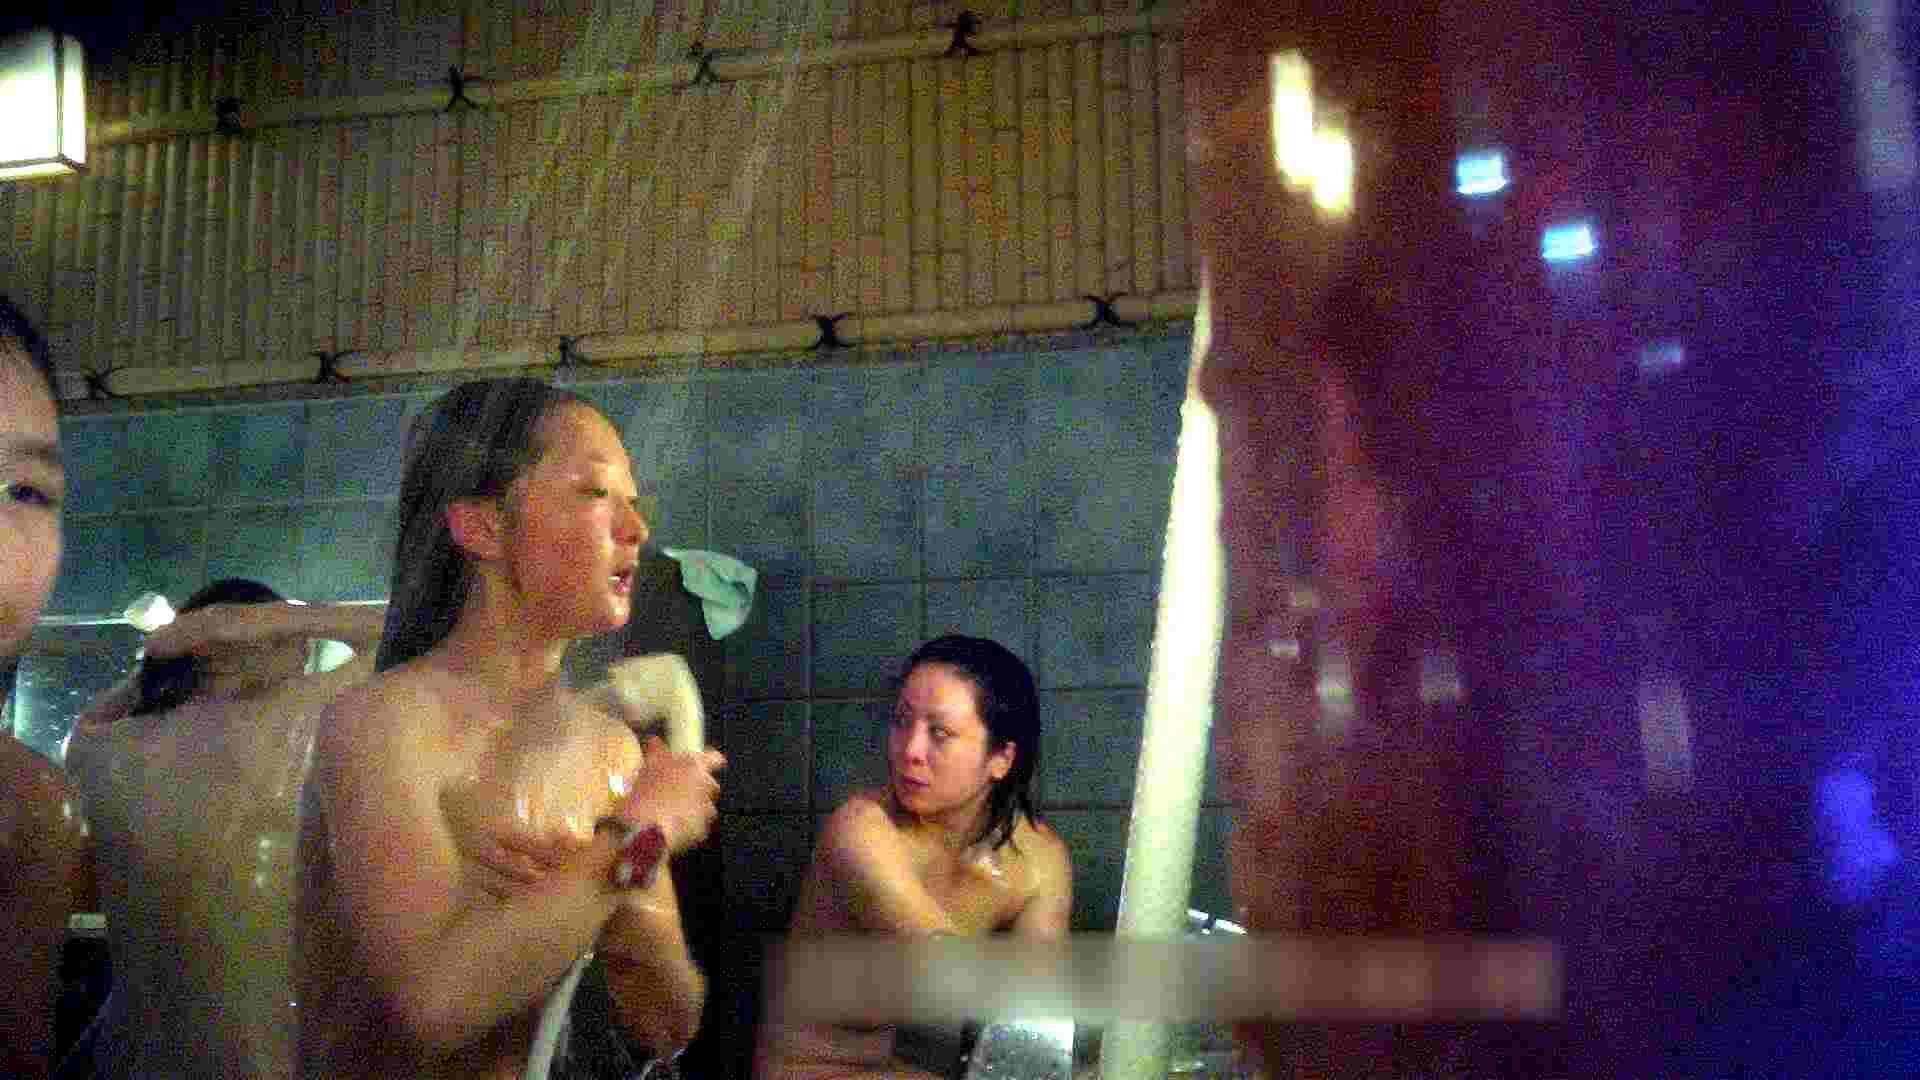 TG.12 【上等兵】いやぁ若い!ぷっちぷちギャル!でも時間短い・・・ 貧乳フェチへ オマンコ動画キャプチャ 106枚 88